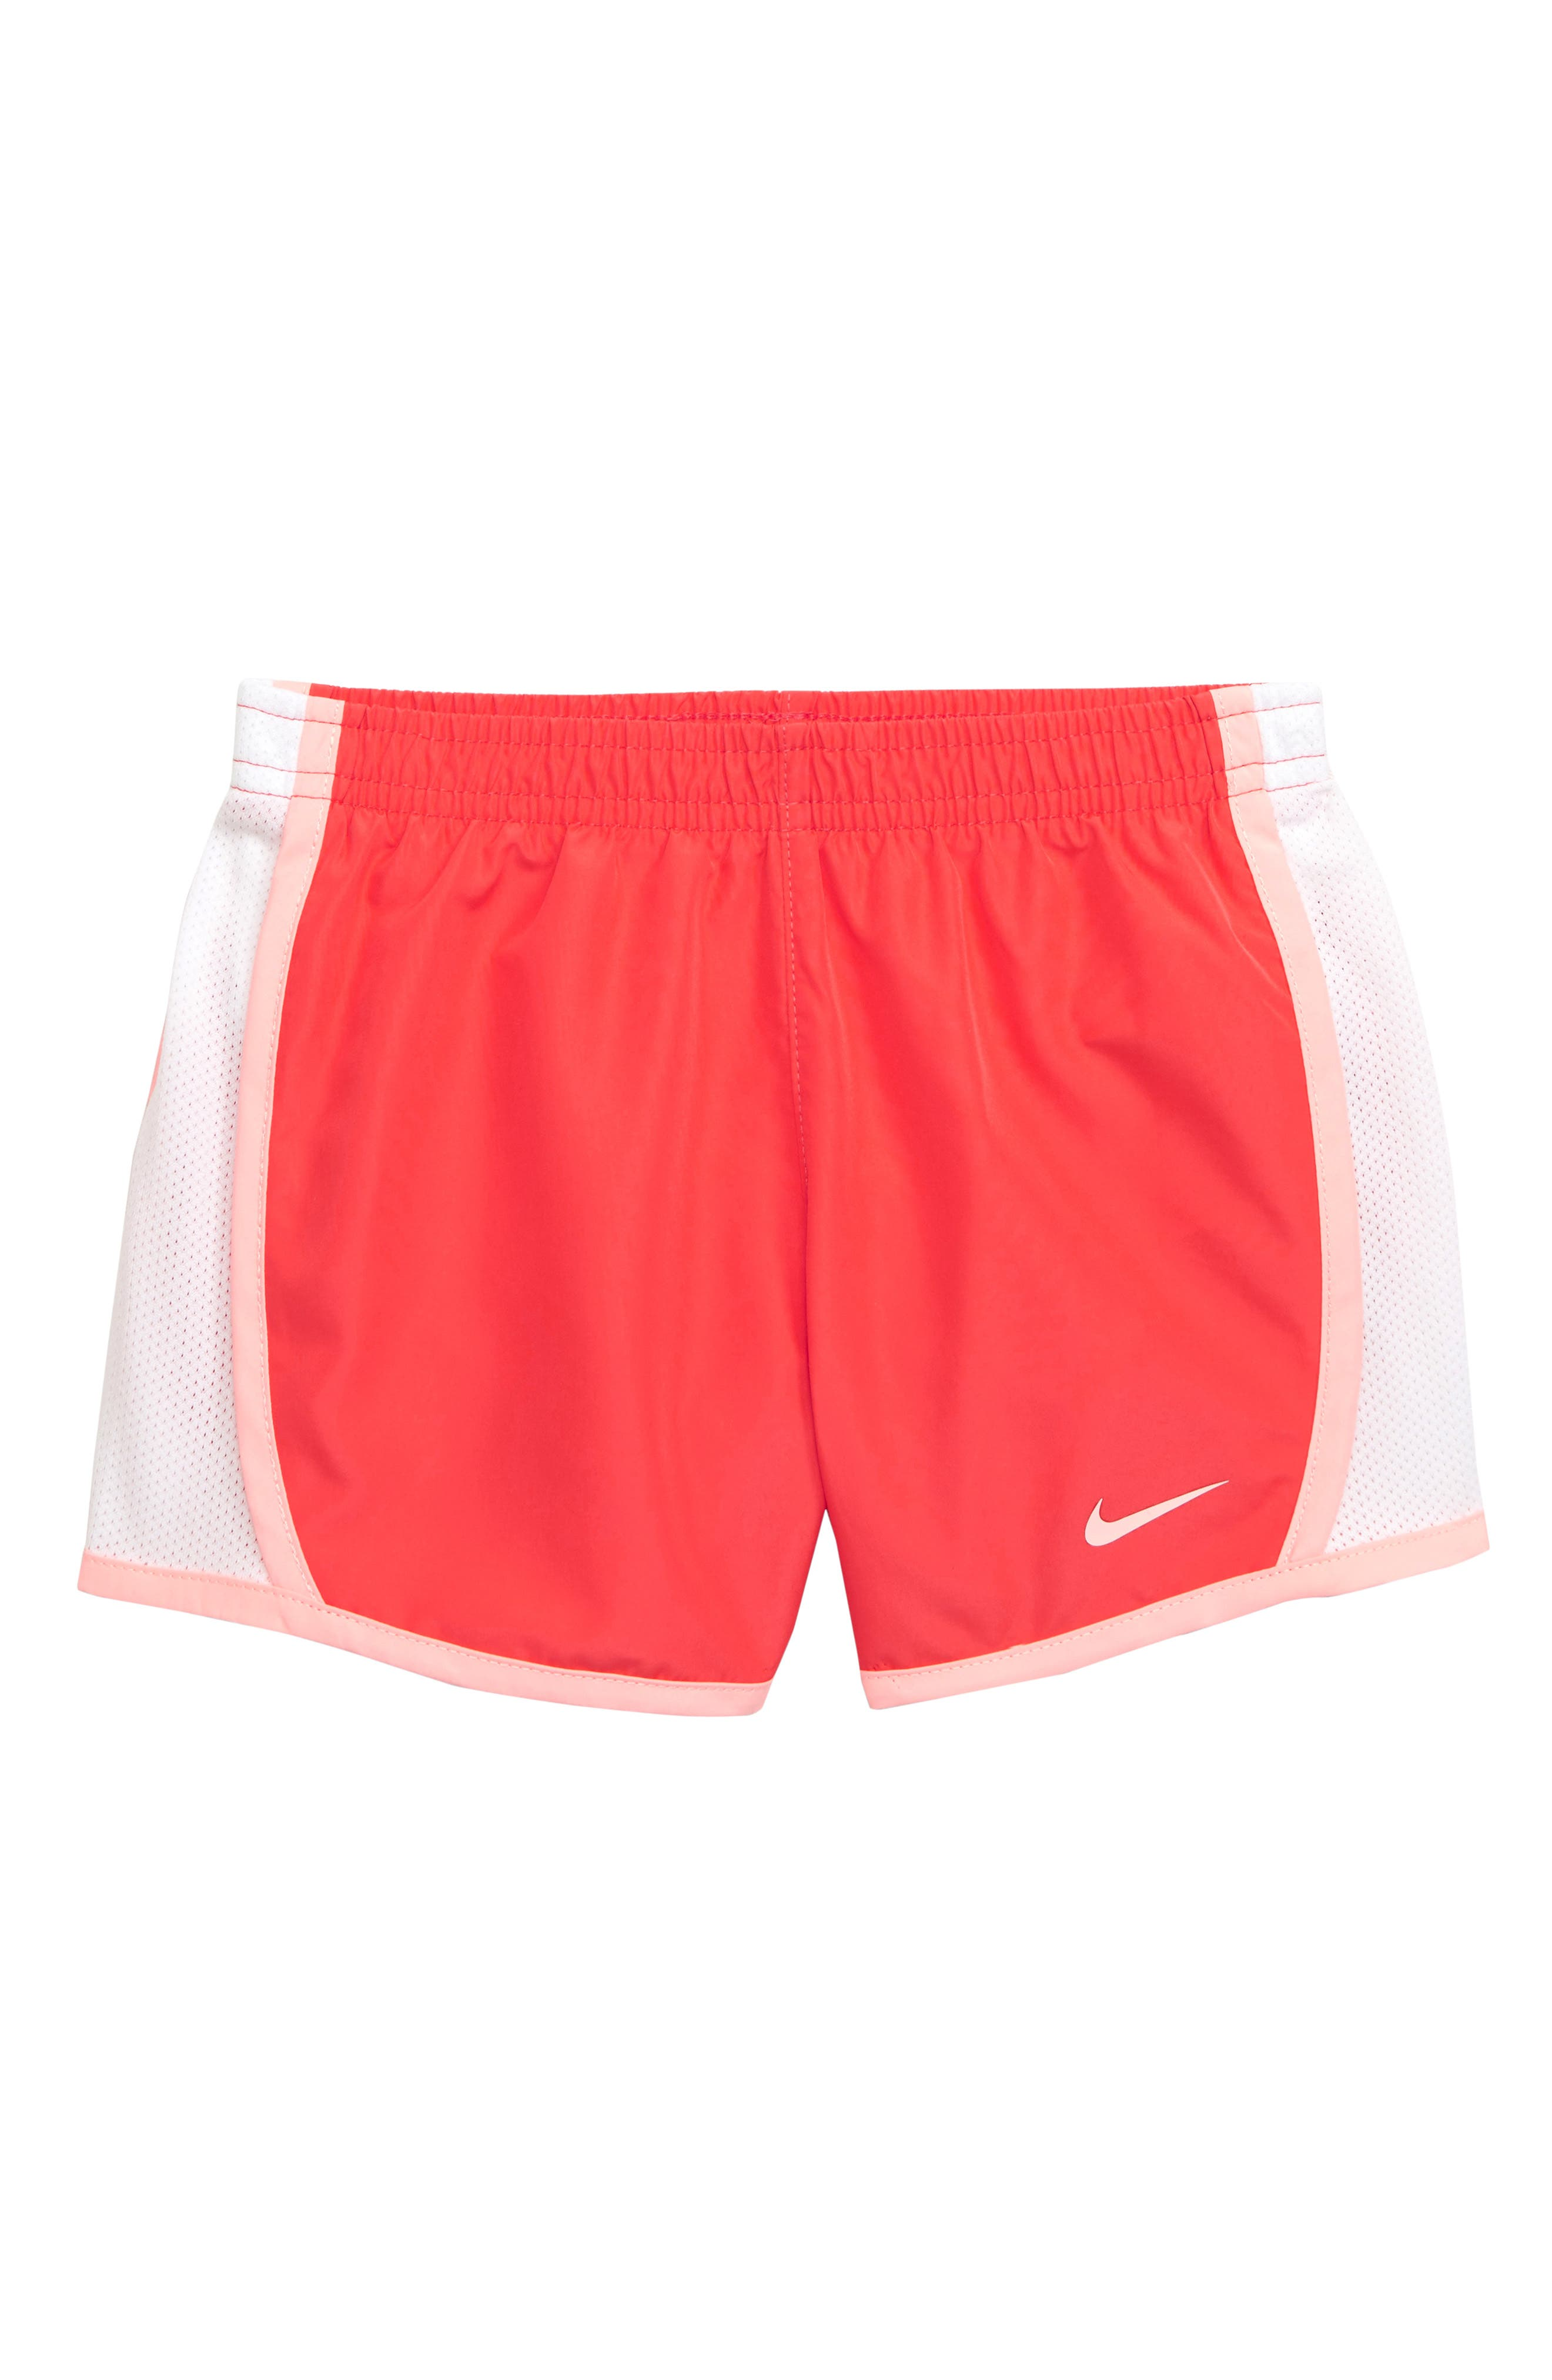 NIKE Tempo Dri-FIT Shorts, Main, color, EMBER GLOW